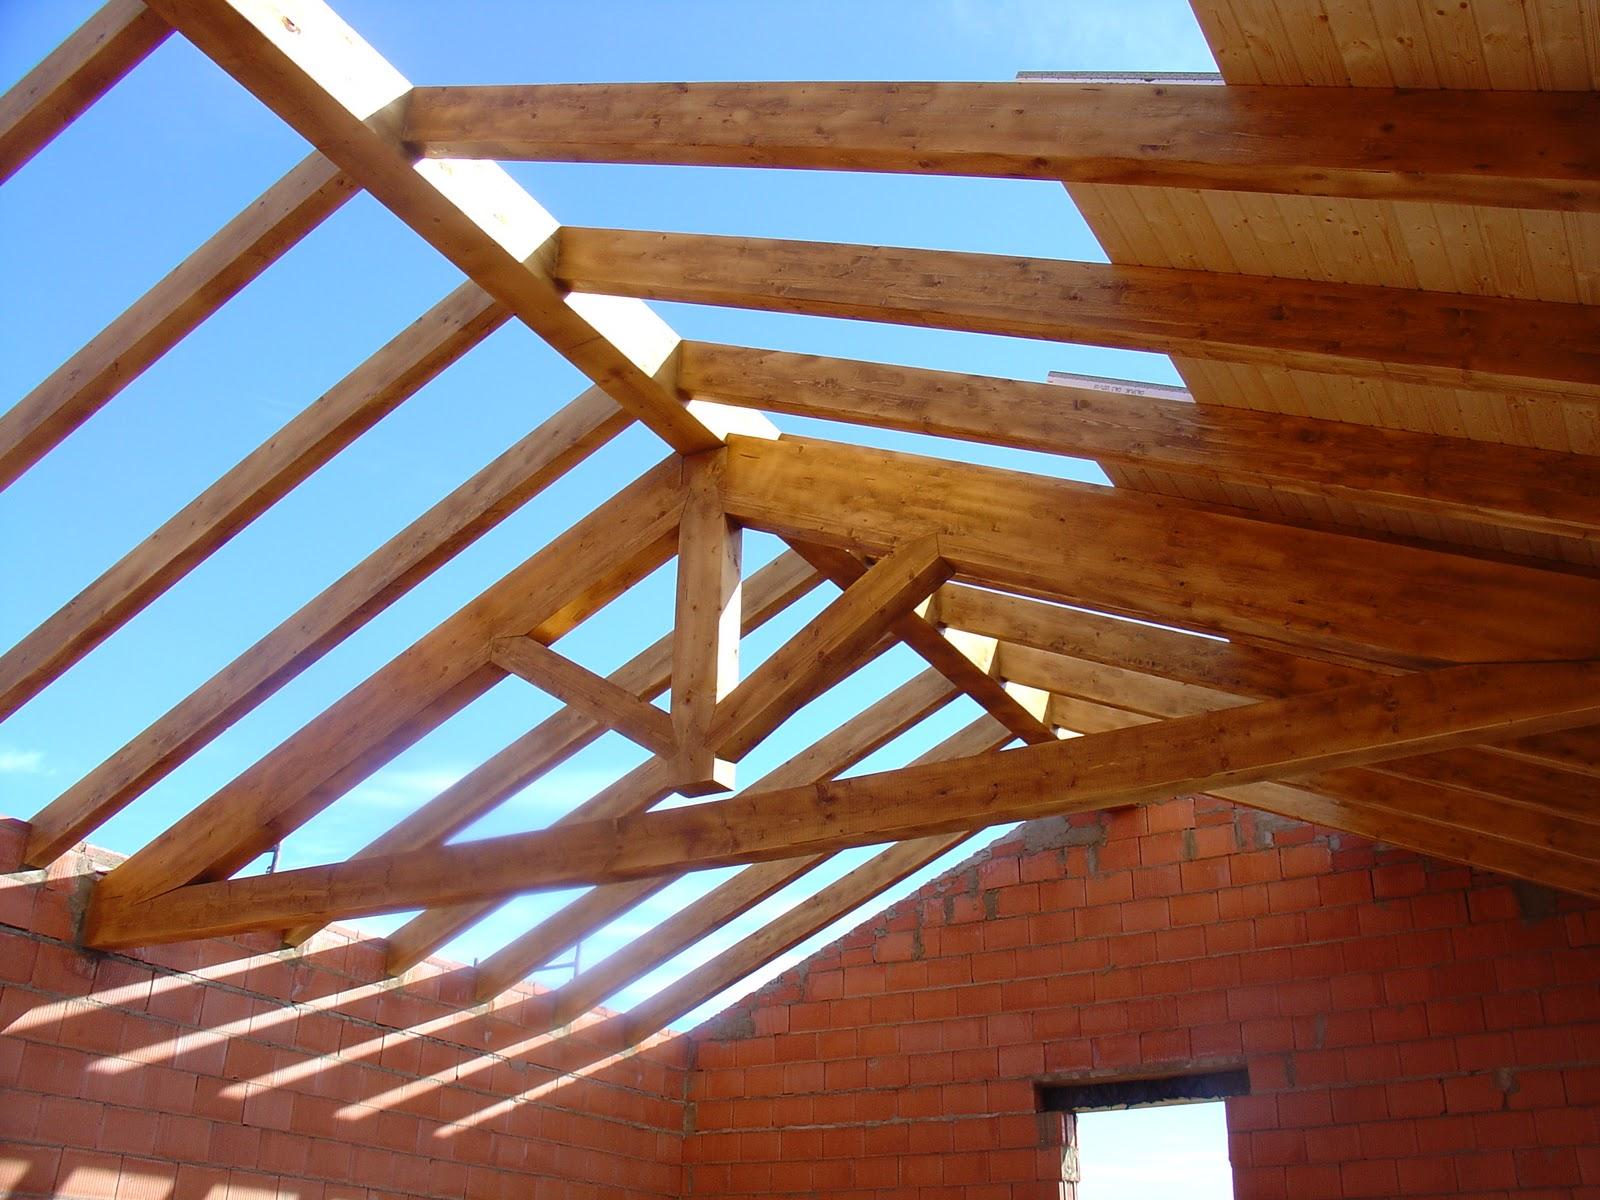 Pope carpinter a tradicional tejado de madera - Vigas de madera para tejados ...